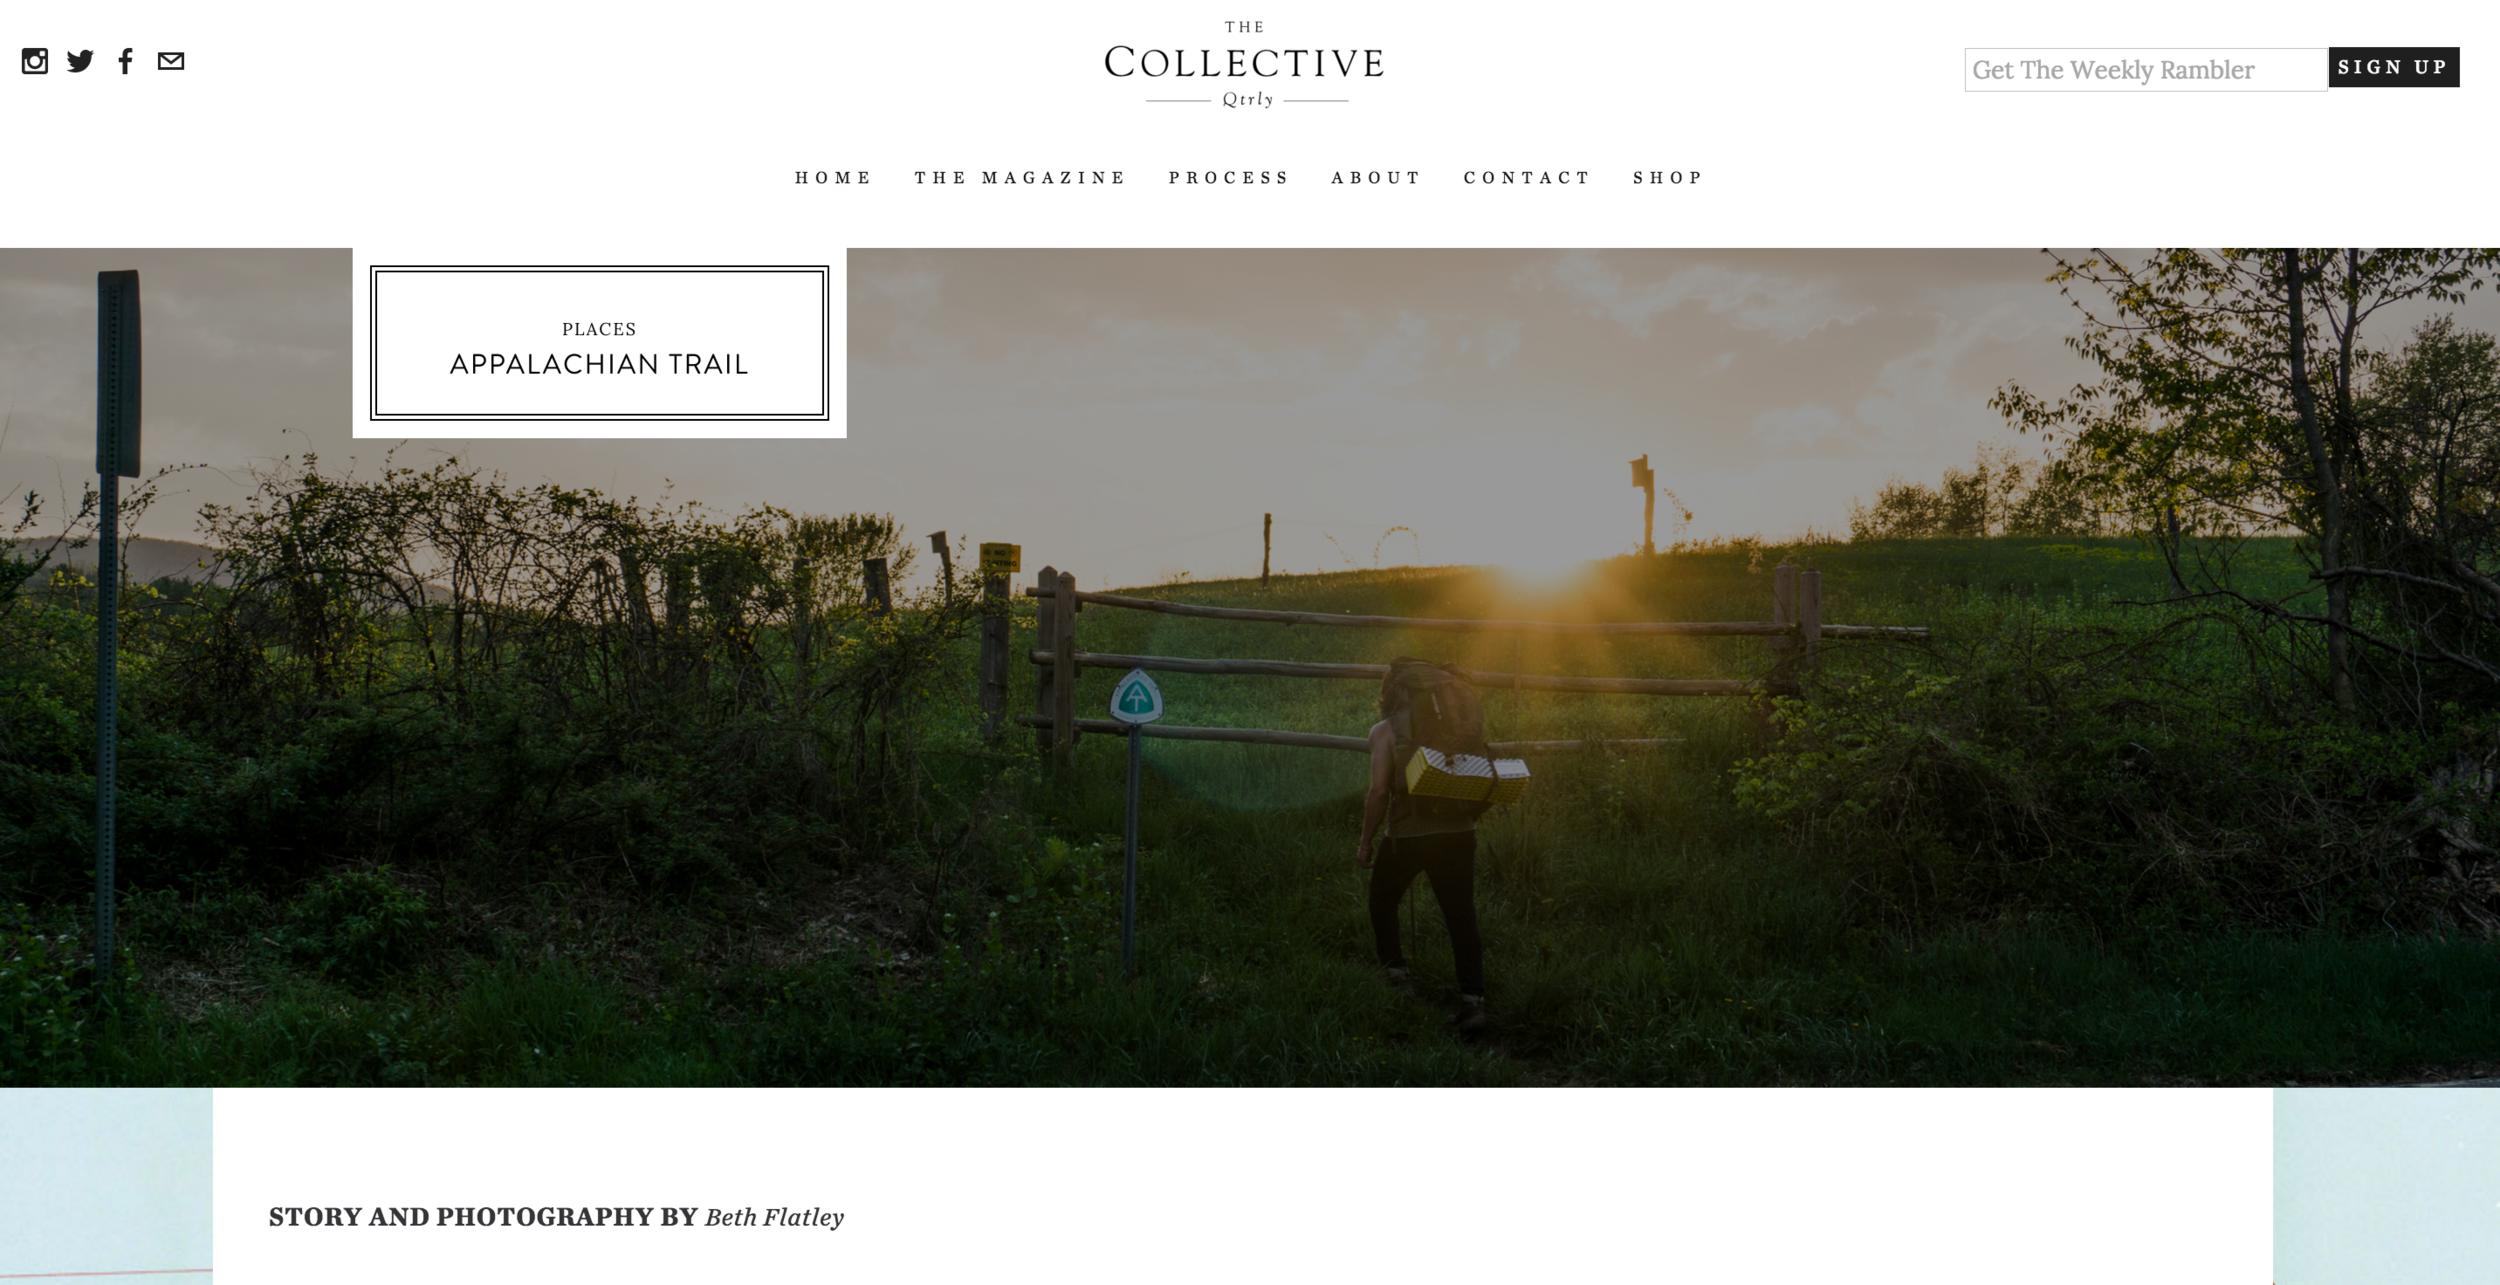 Collective Quarterly